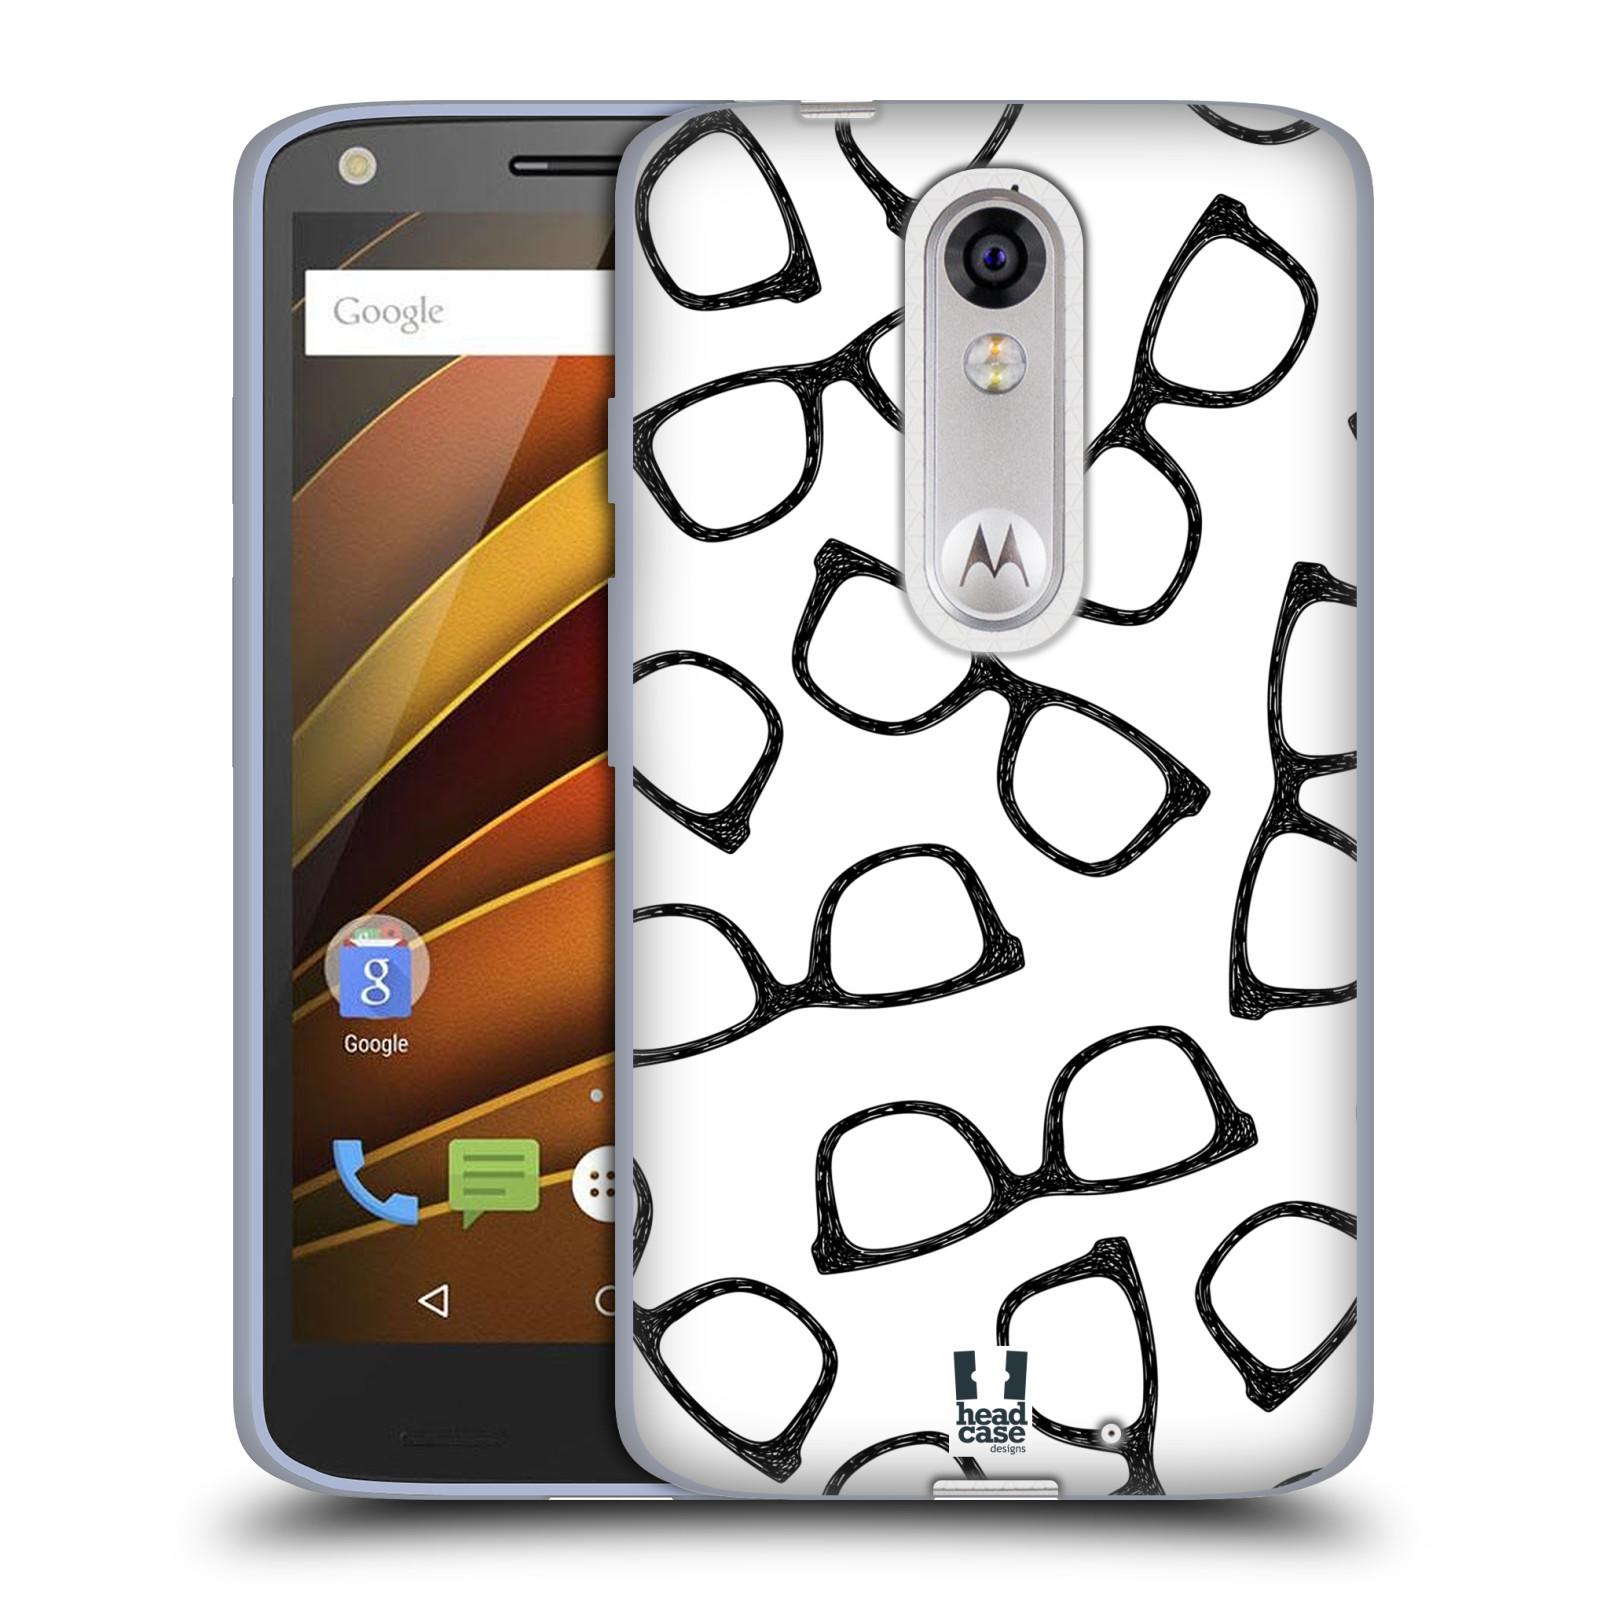 Silikonové pouzdro na mobil Lenovo Moto X Force HEAD CASE HIPSTER BRÝLE (Silikonový kryt či obal na mobilní telefon Lenovo Moto X Force (Motorola))